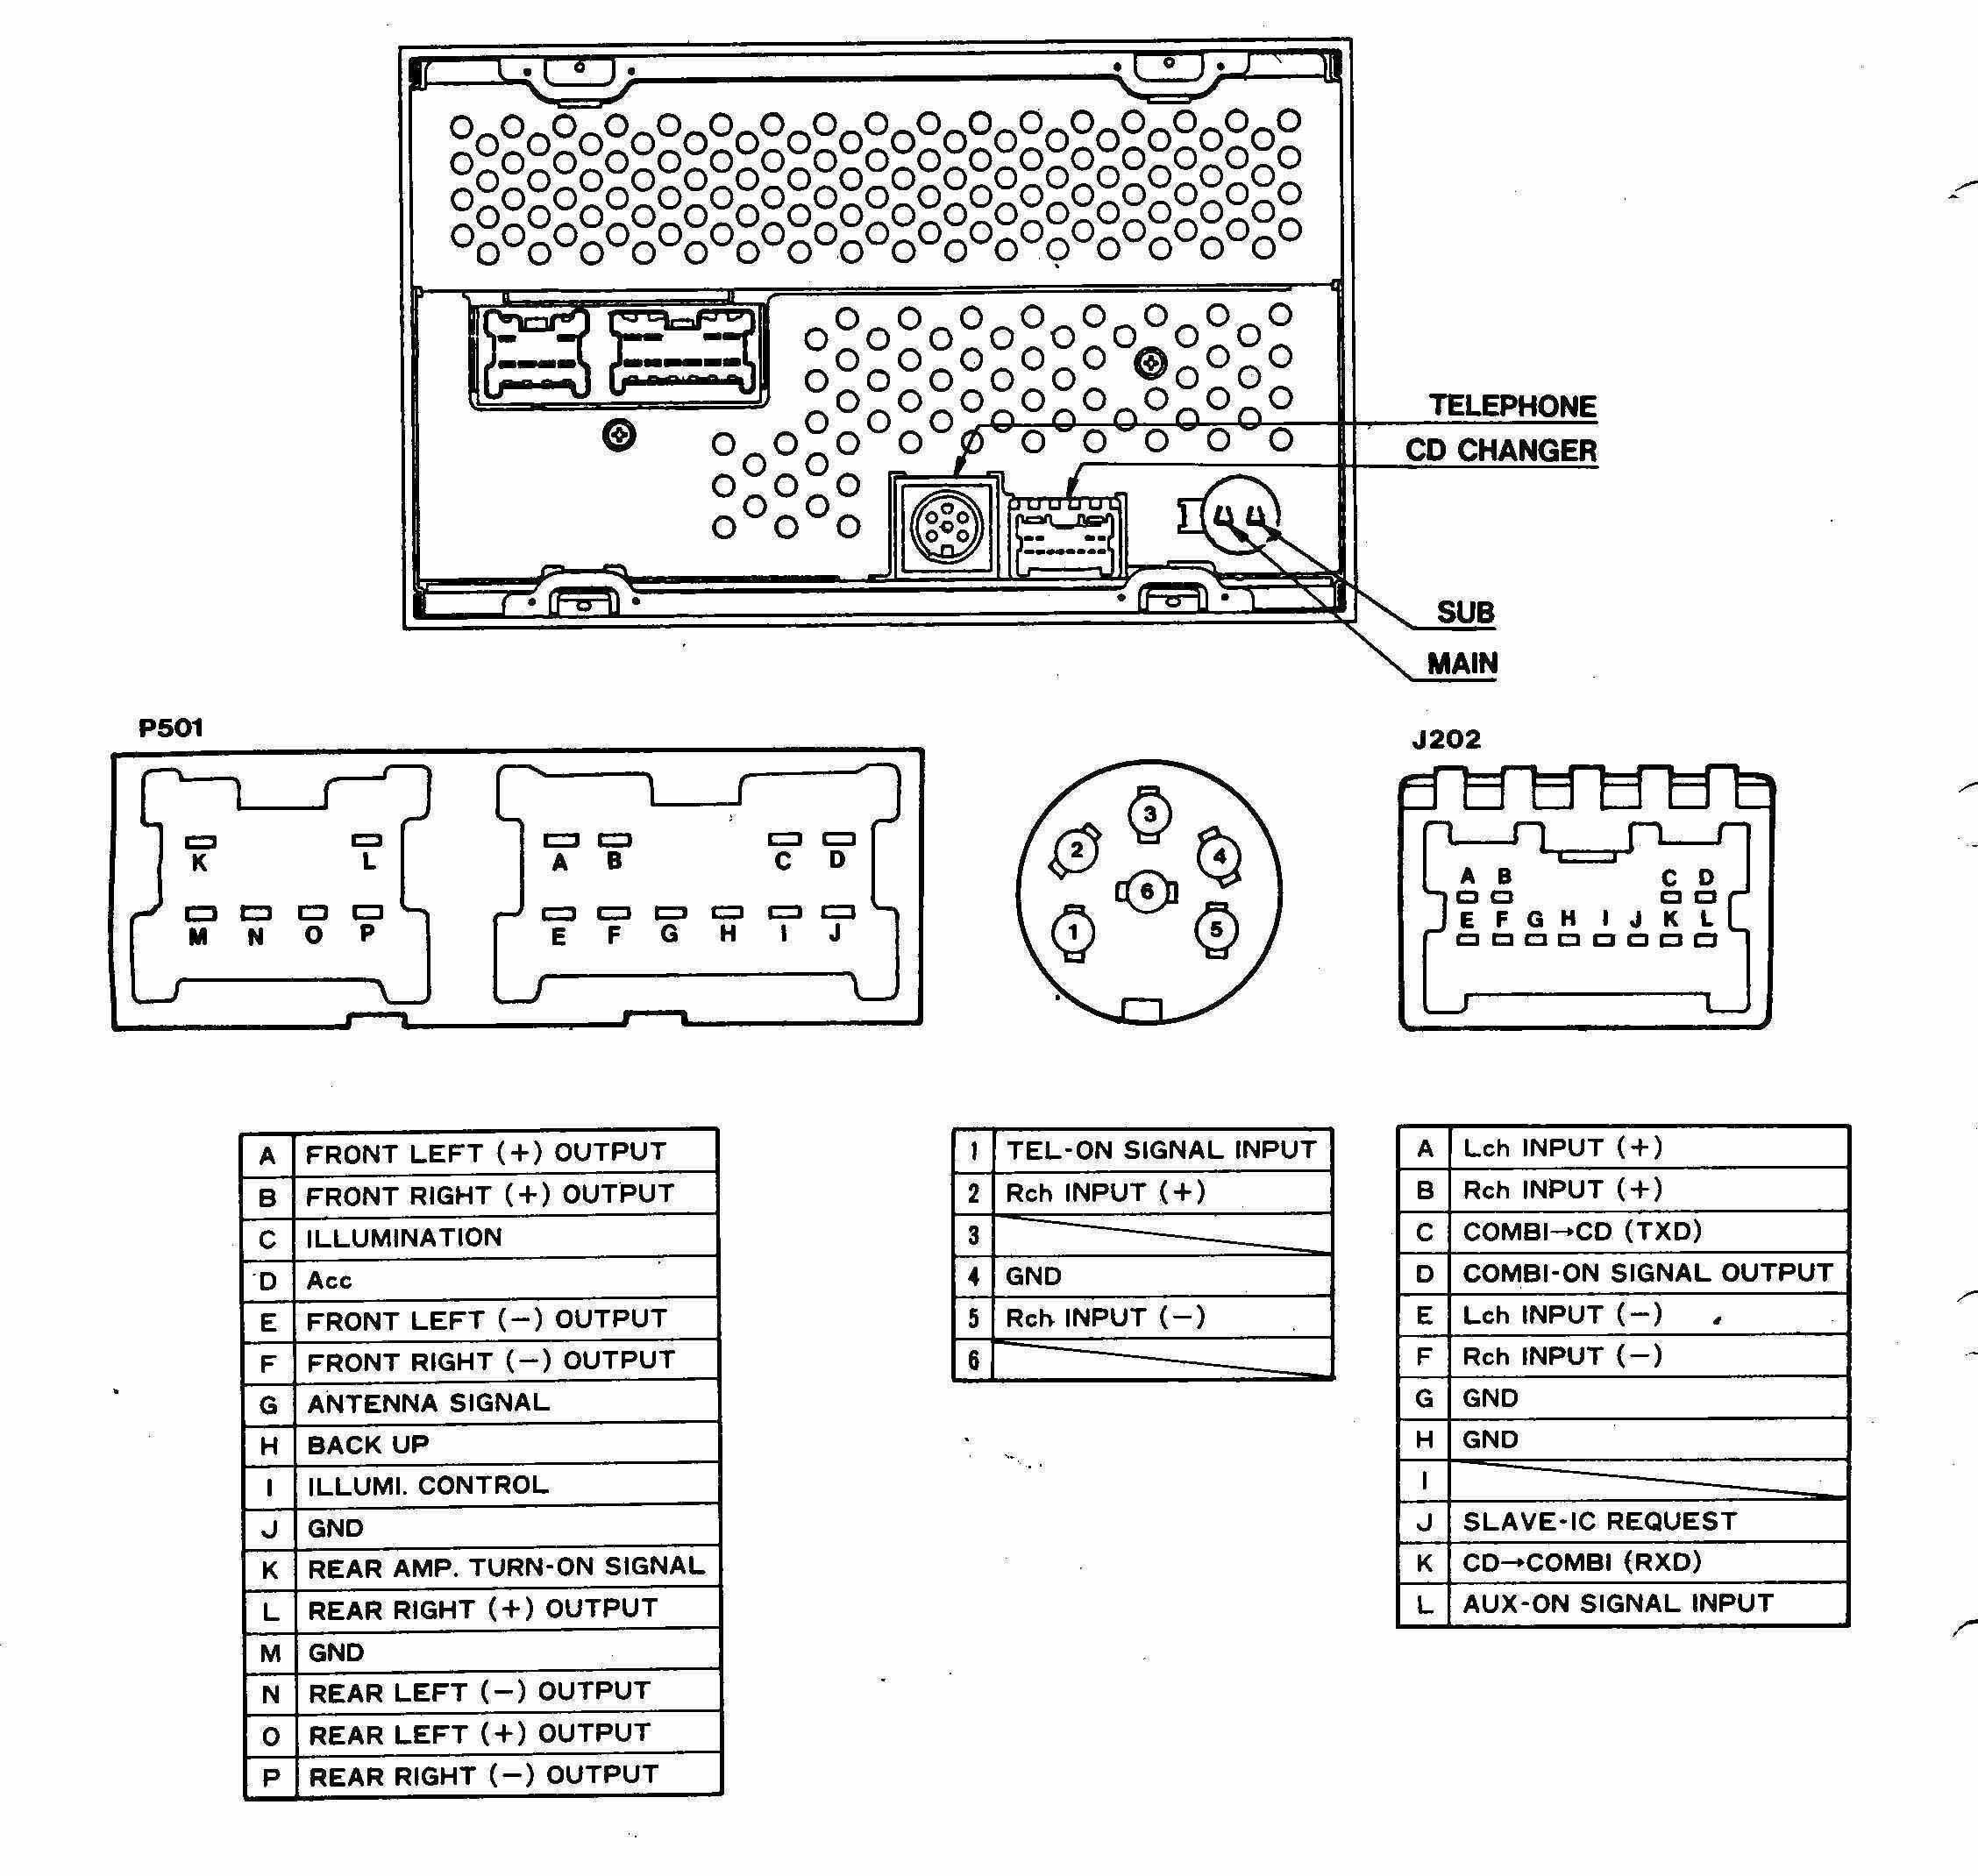 Onan Wiring Harness Color Code | Wiring Diagram - Scosche Wiring Harness Diagram